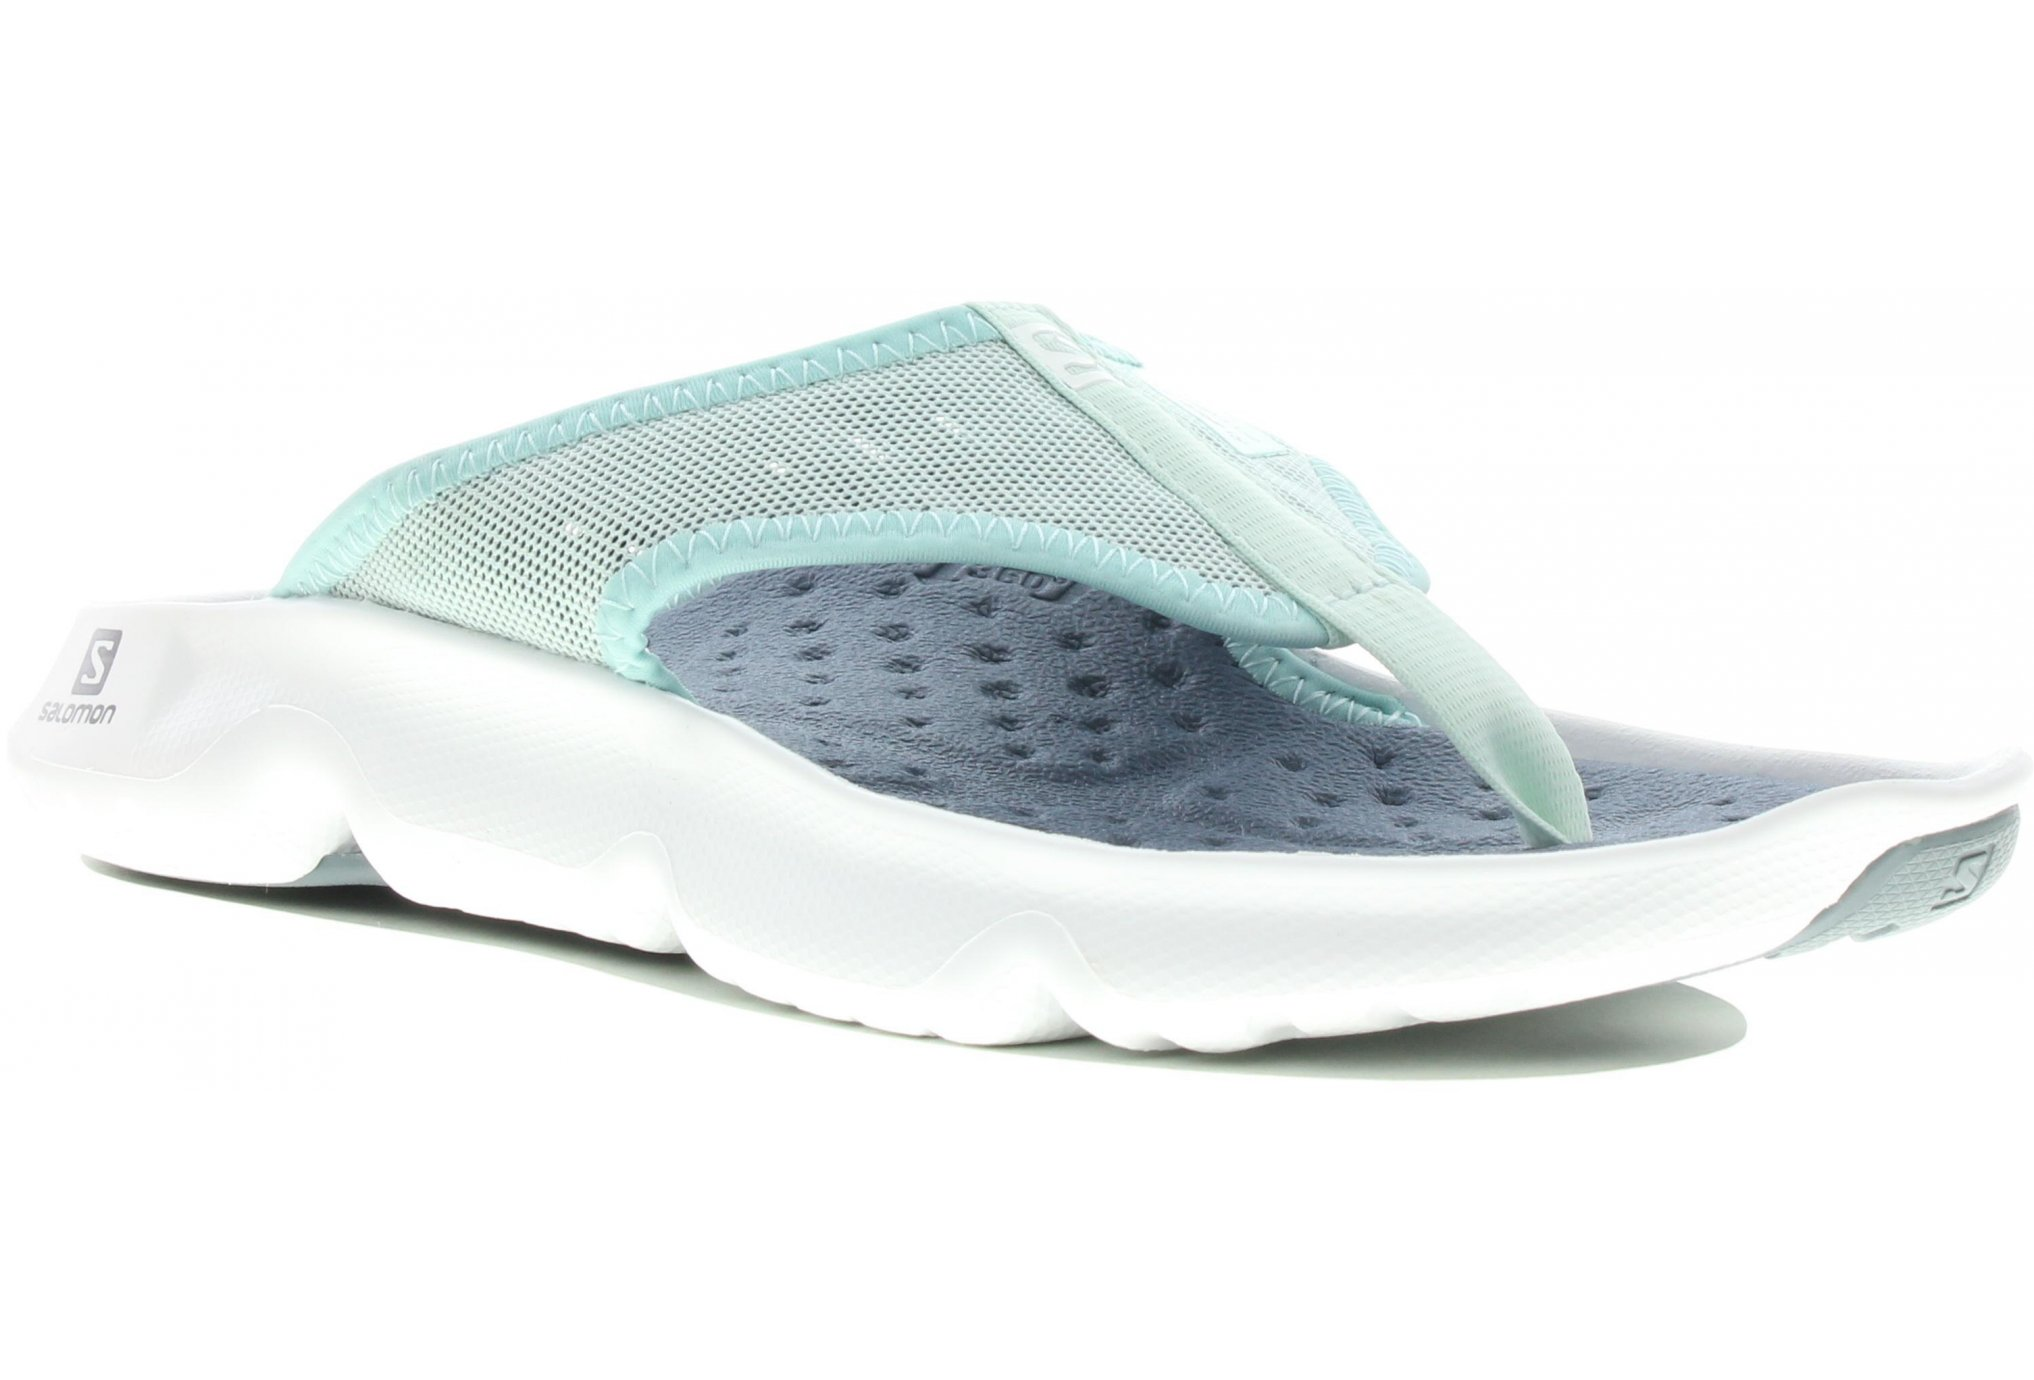 Salomon Reelax Break 5.0 W Chaussures running femme